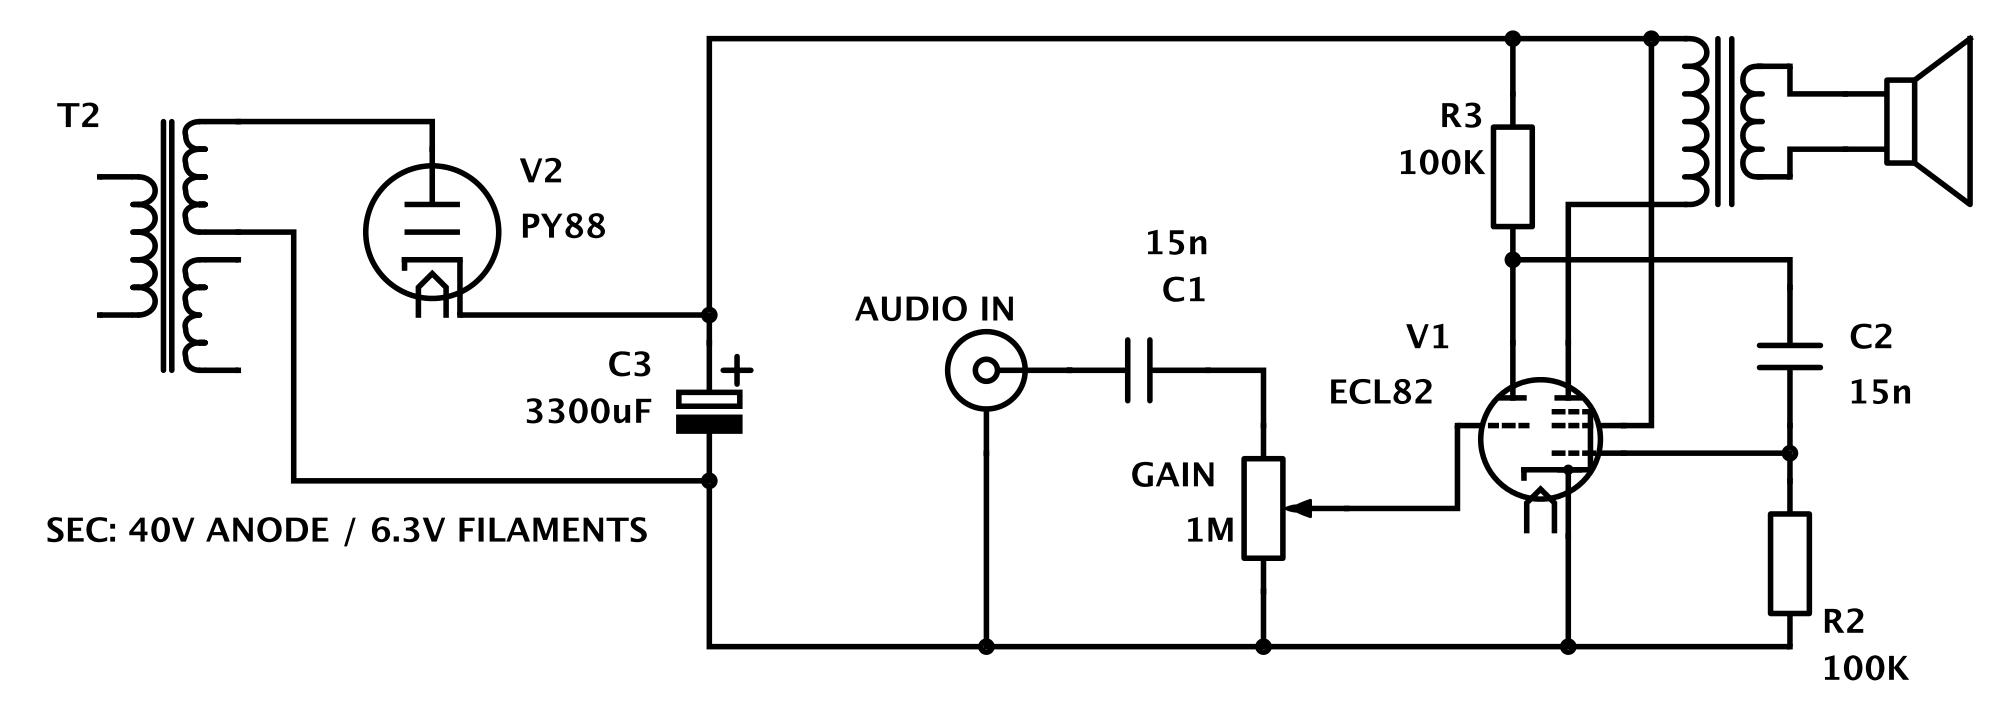 Making Tube Amplifier Wiring Schematic : 38 Wiring Diagram